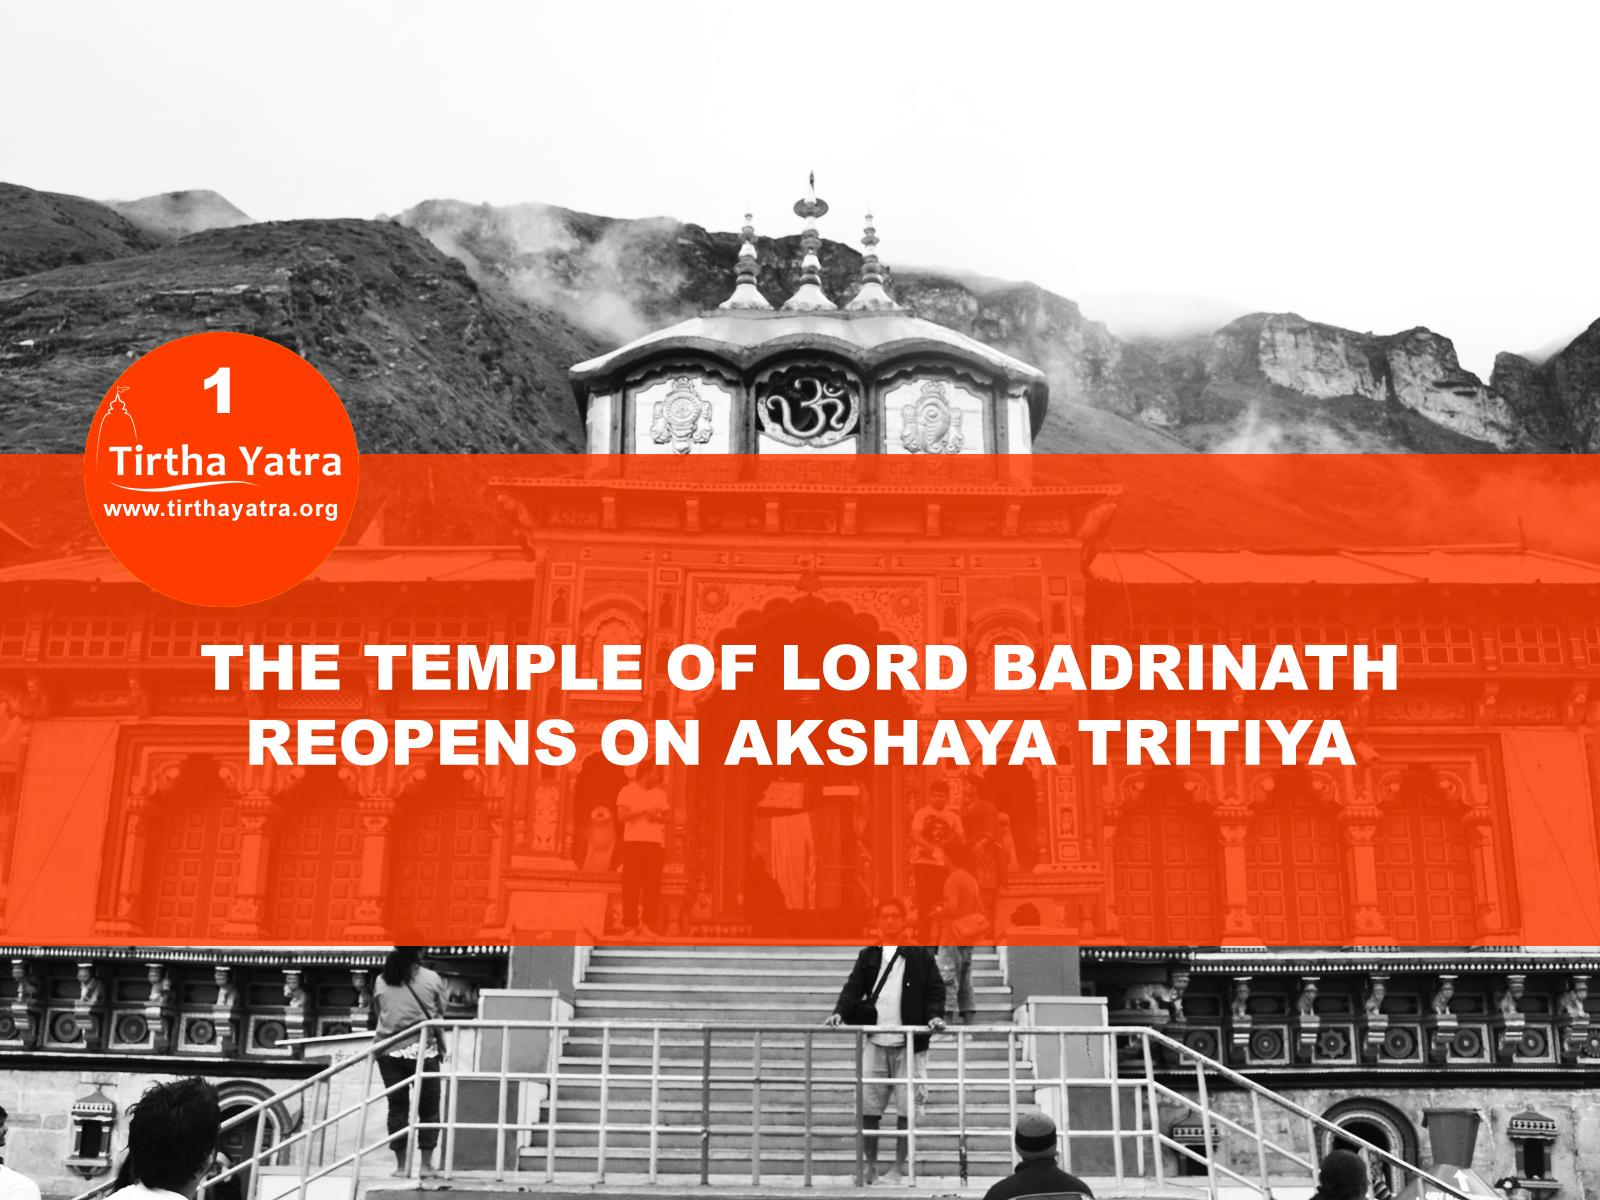 Badrinath temple opens on Akshaya Tritiya